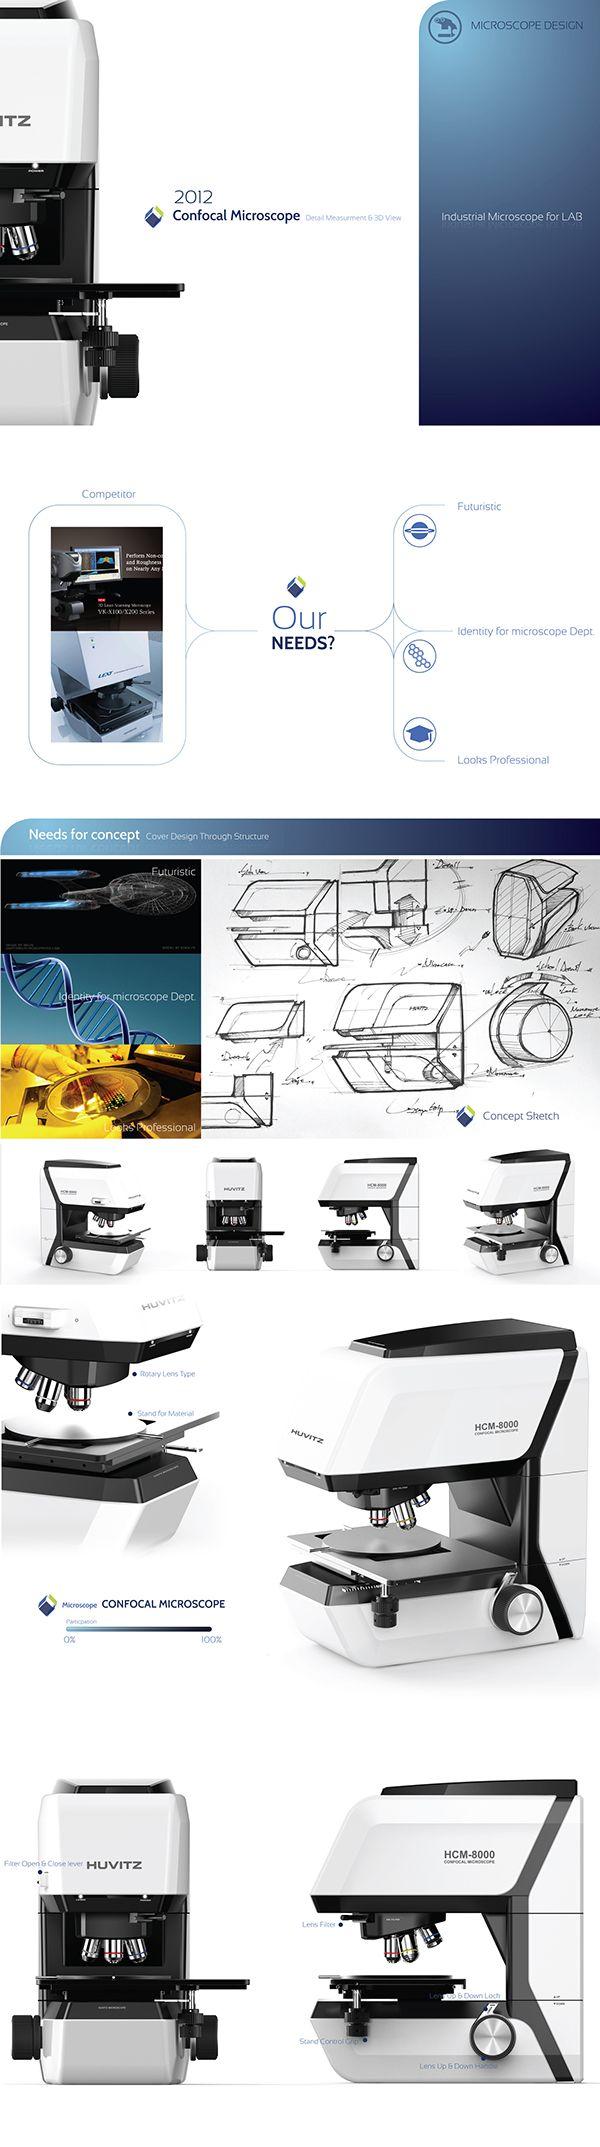 Microscope Design_2012 on Behance